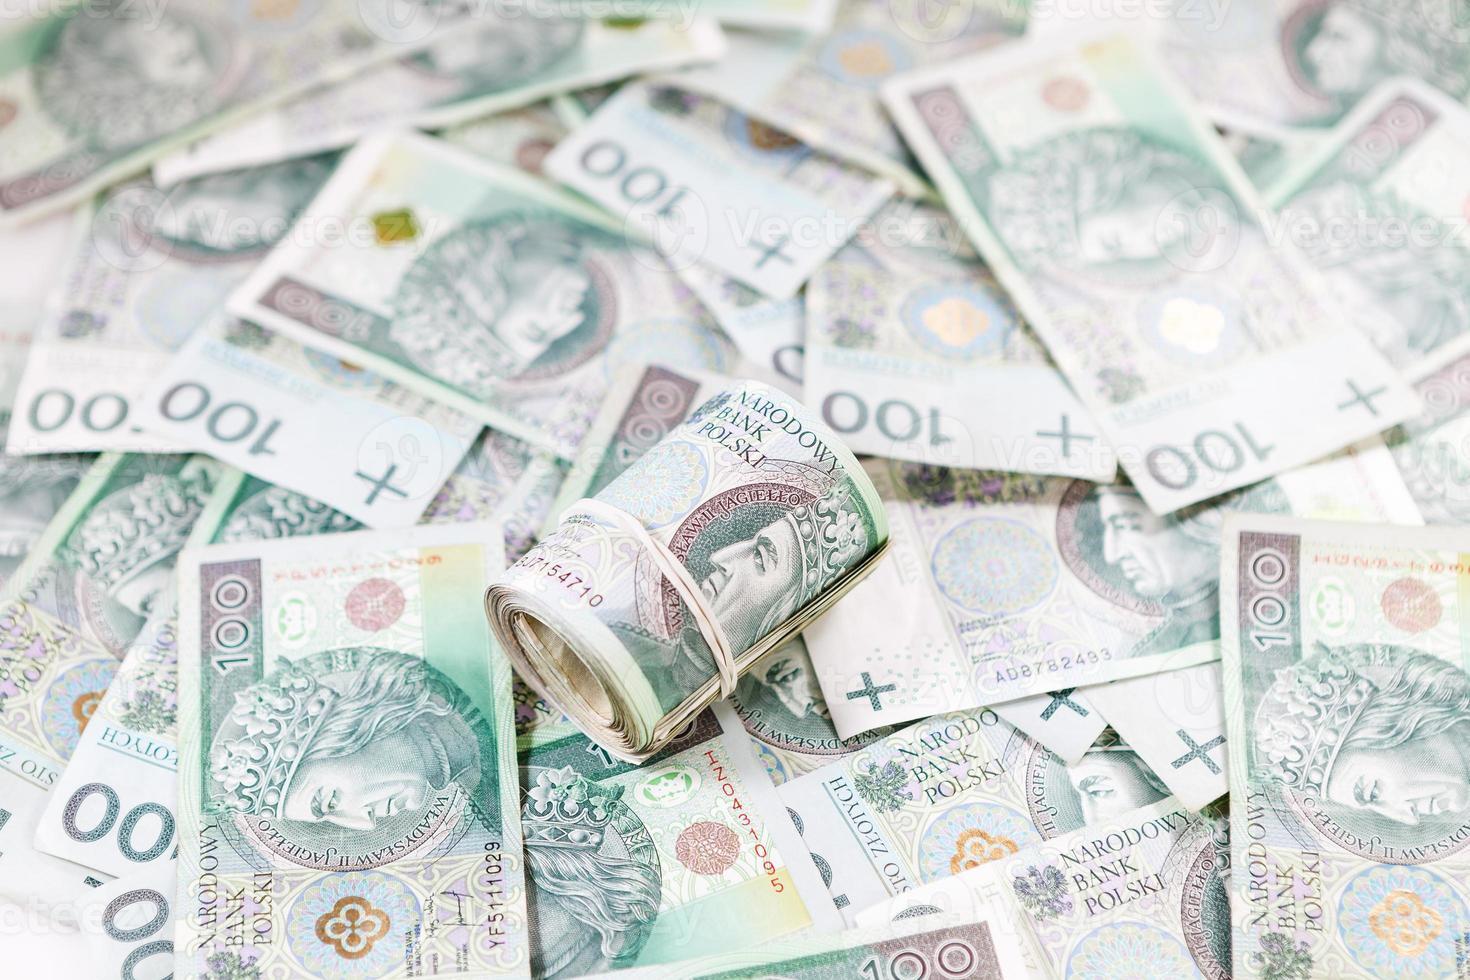 batuffolo di denaro su sfondo di banconote foto